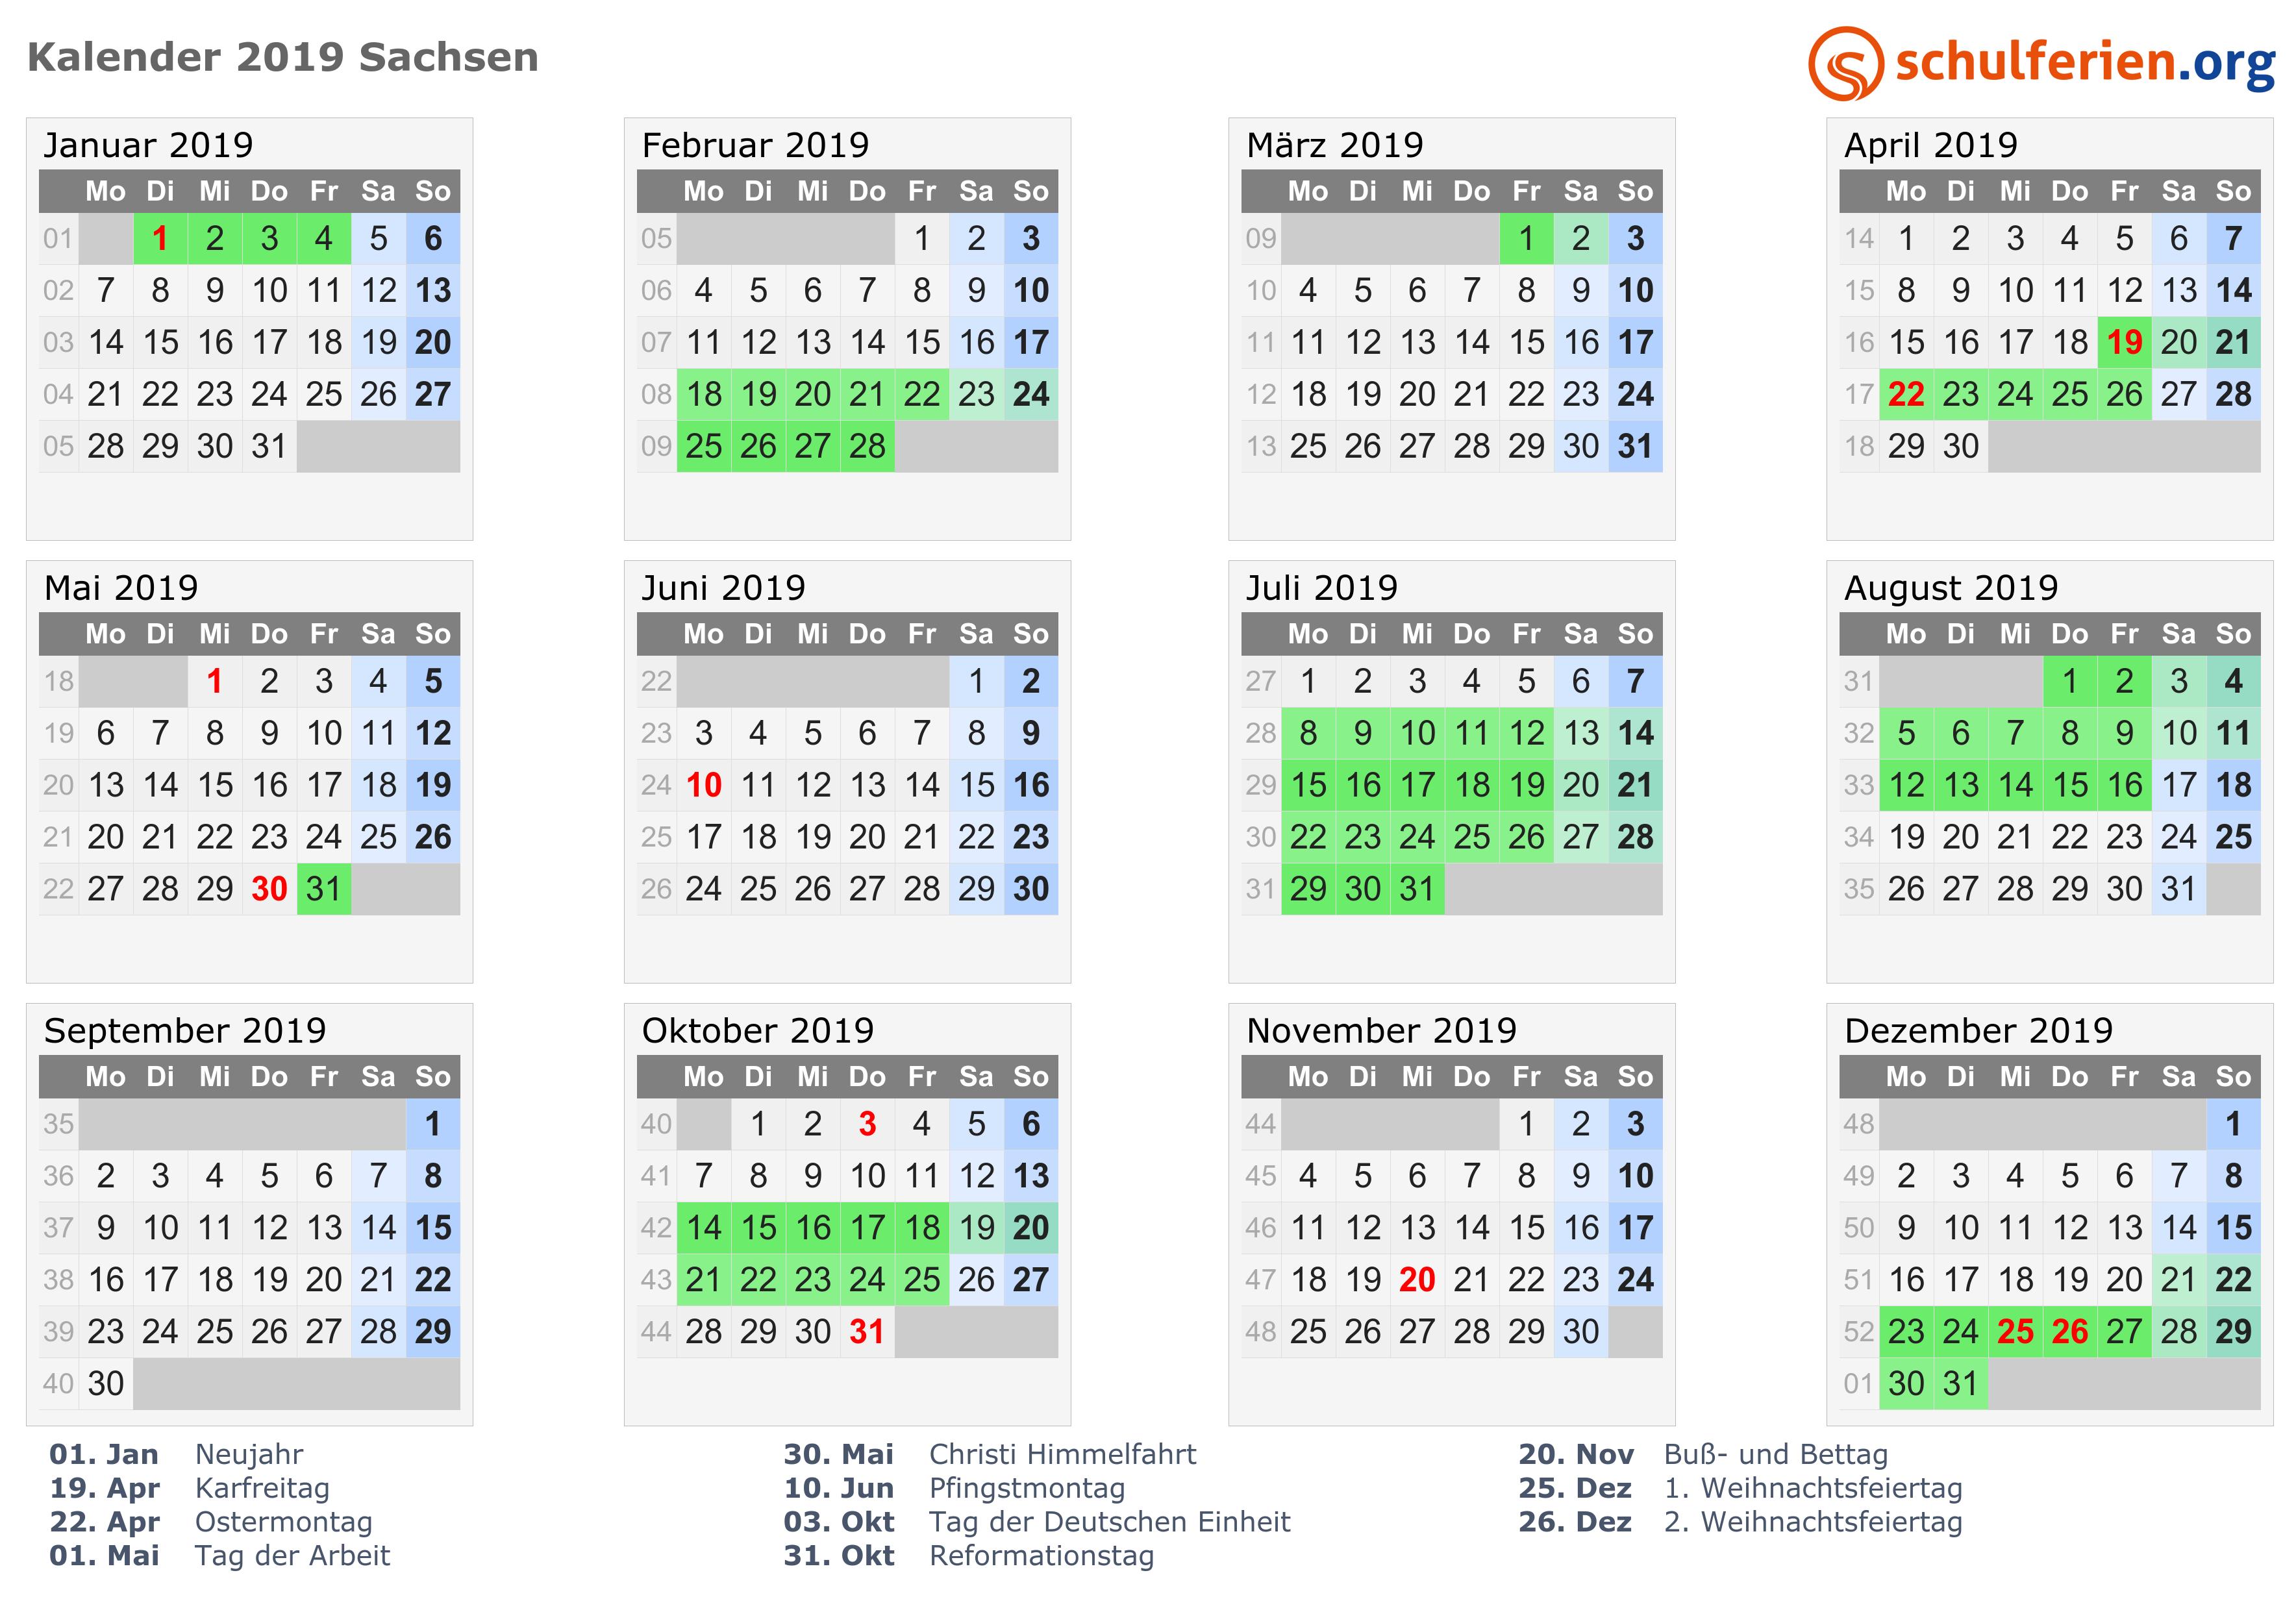 kalender 2019 ferien sachsen feiertage. Black Bedroom Furniture Sets. Home Design Ideas